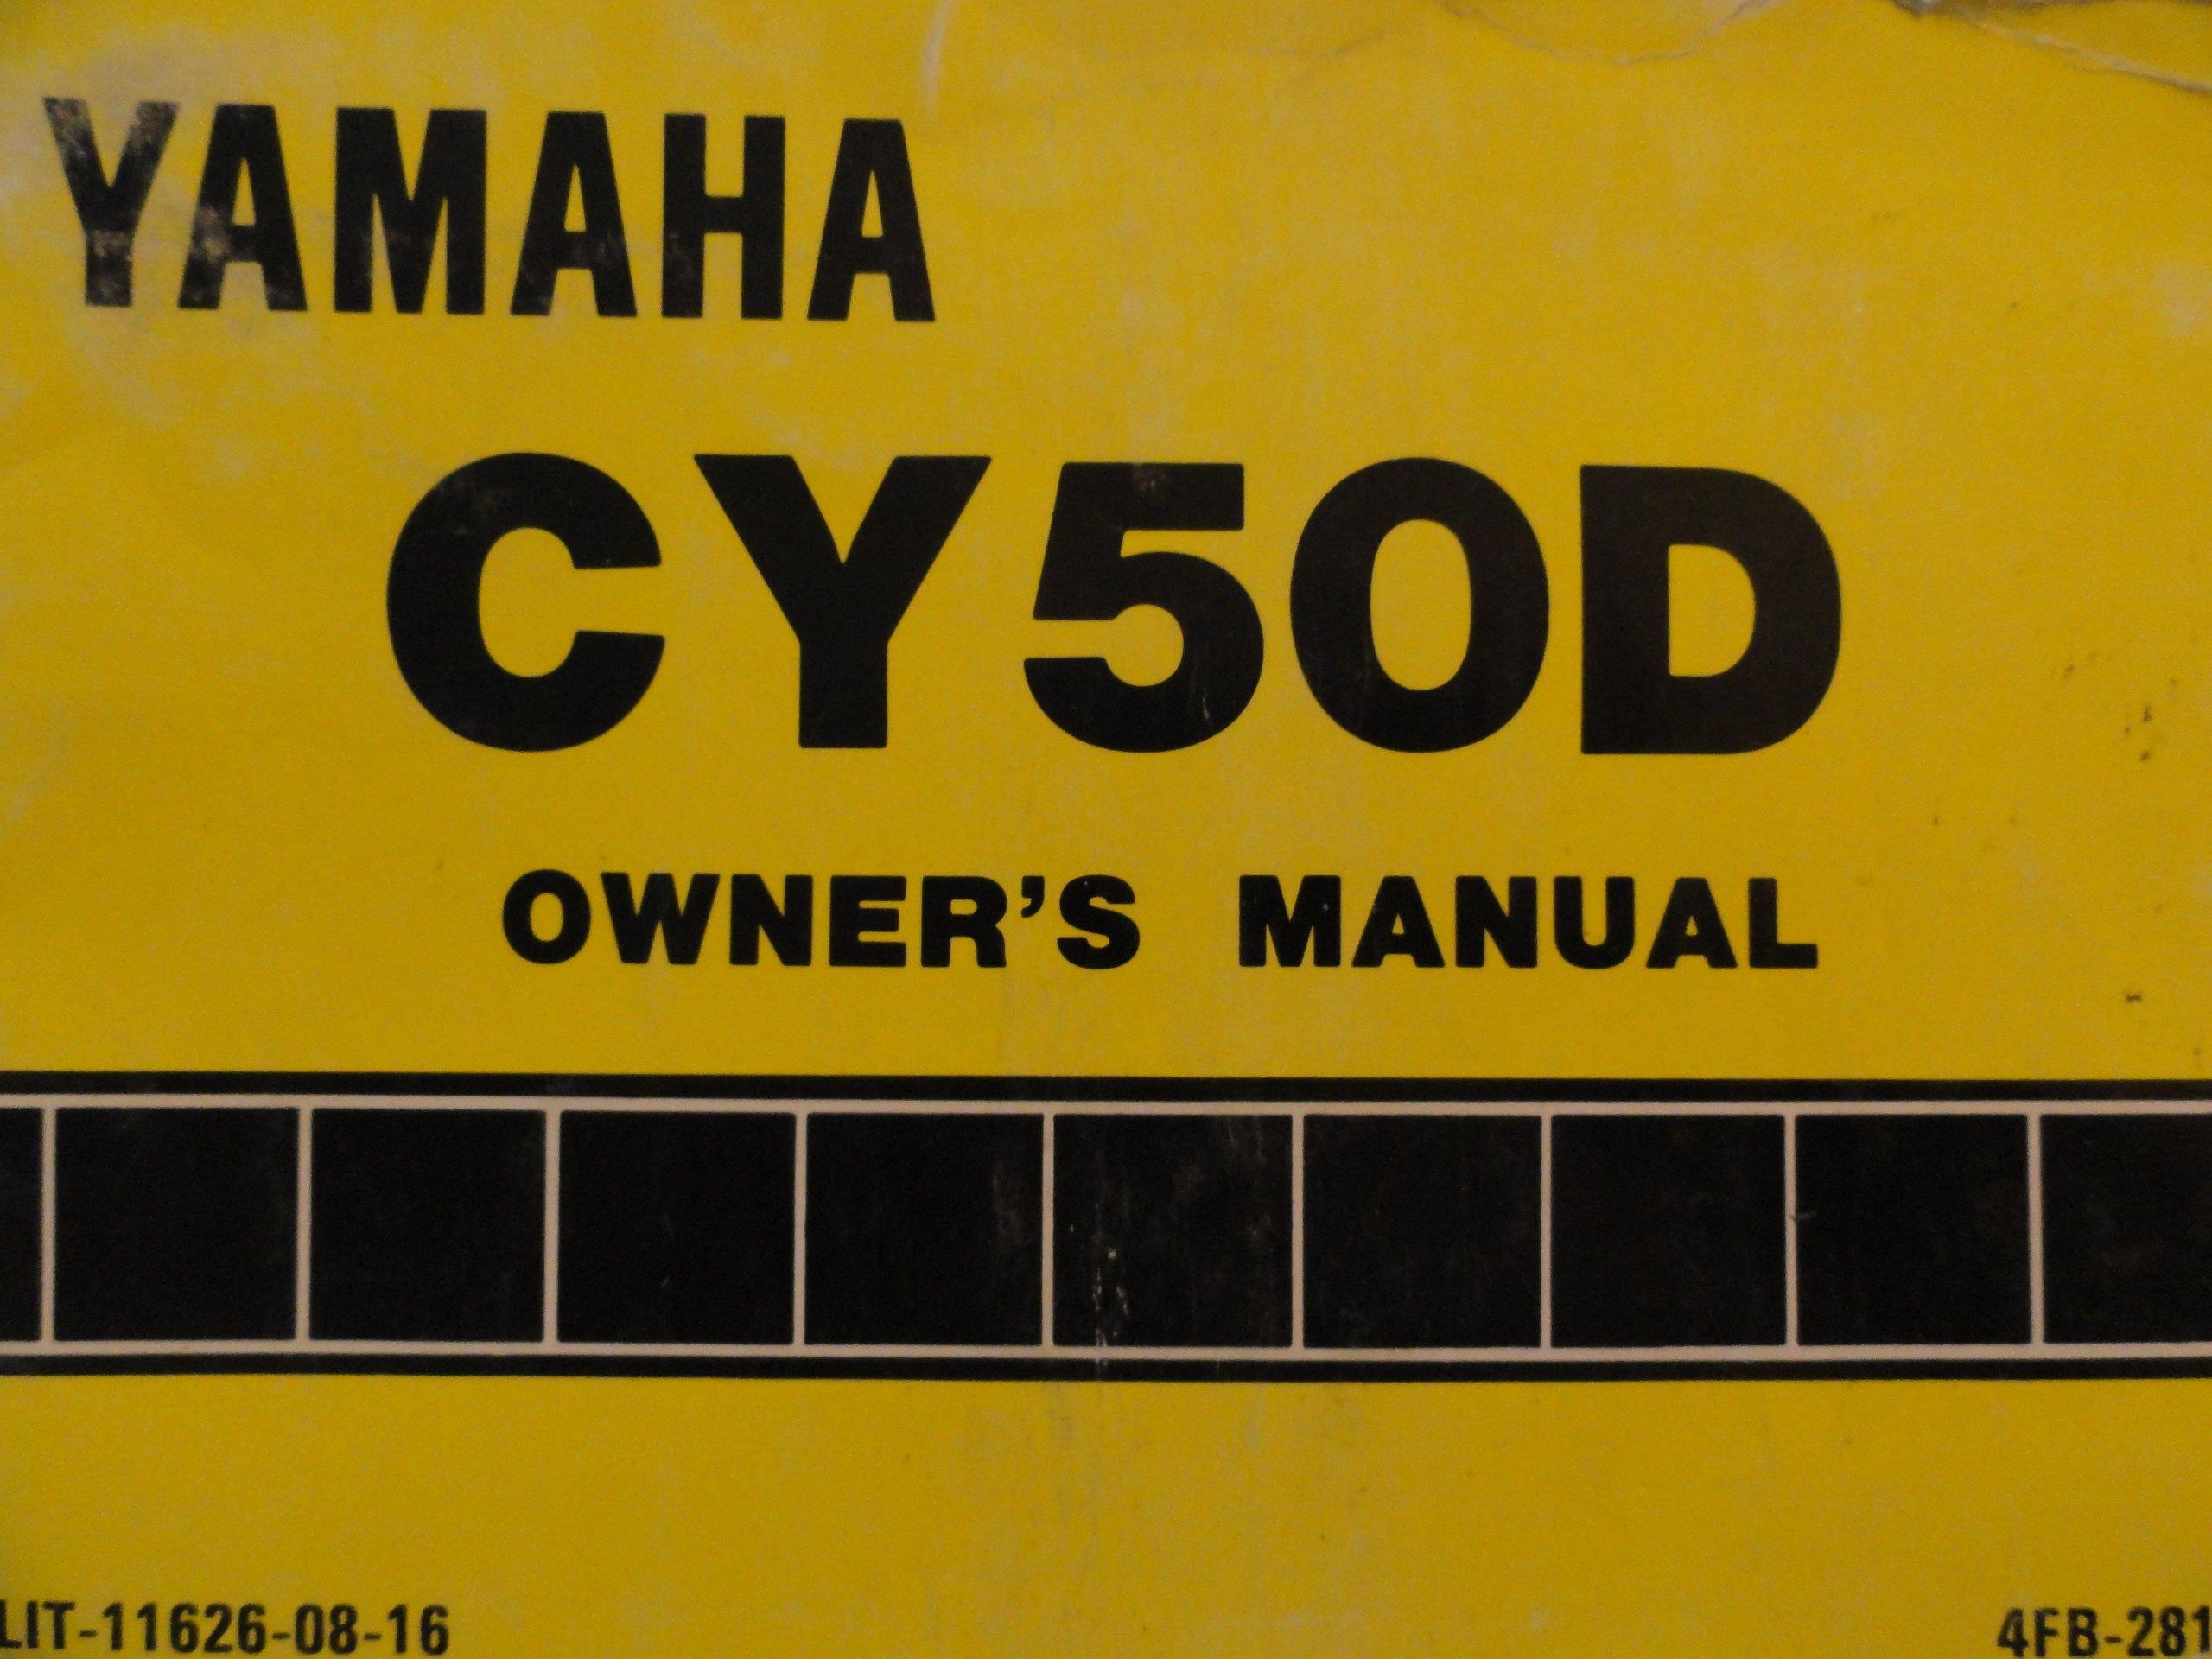 cy50 a wiring diagram 1991 1992 yamaha cy50 owners manual cy 50 d yamaha amazon com books  1991 1992 yamaha cy50 owners manual cy